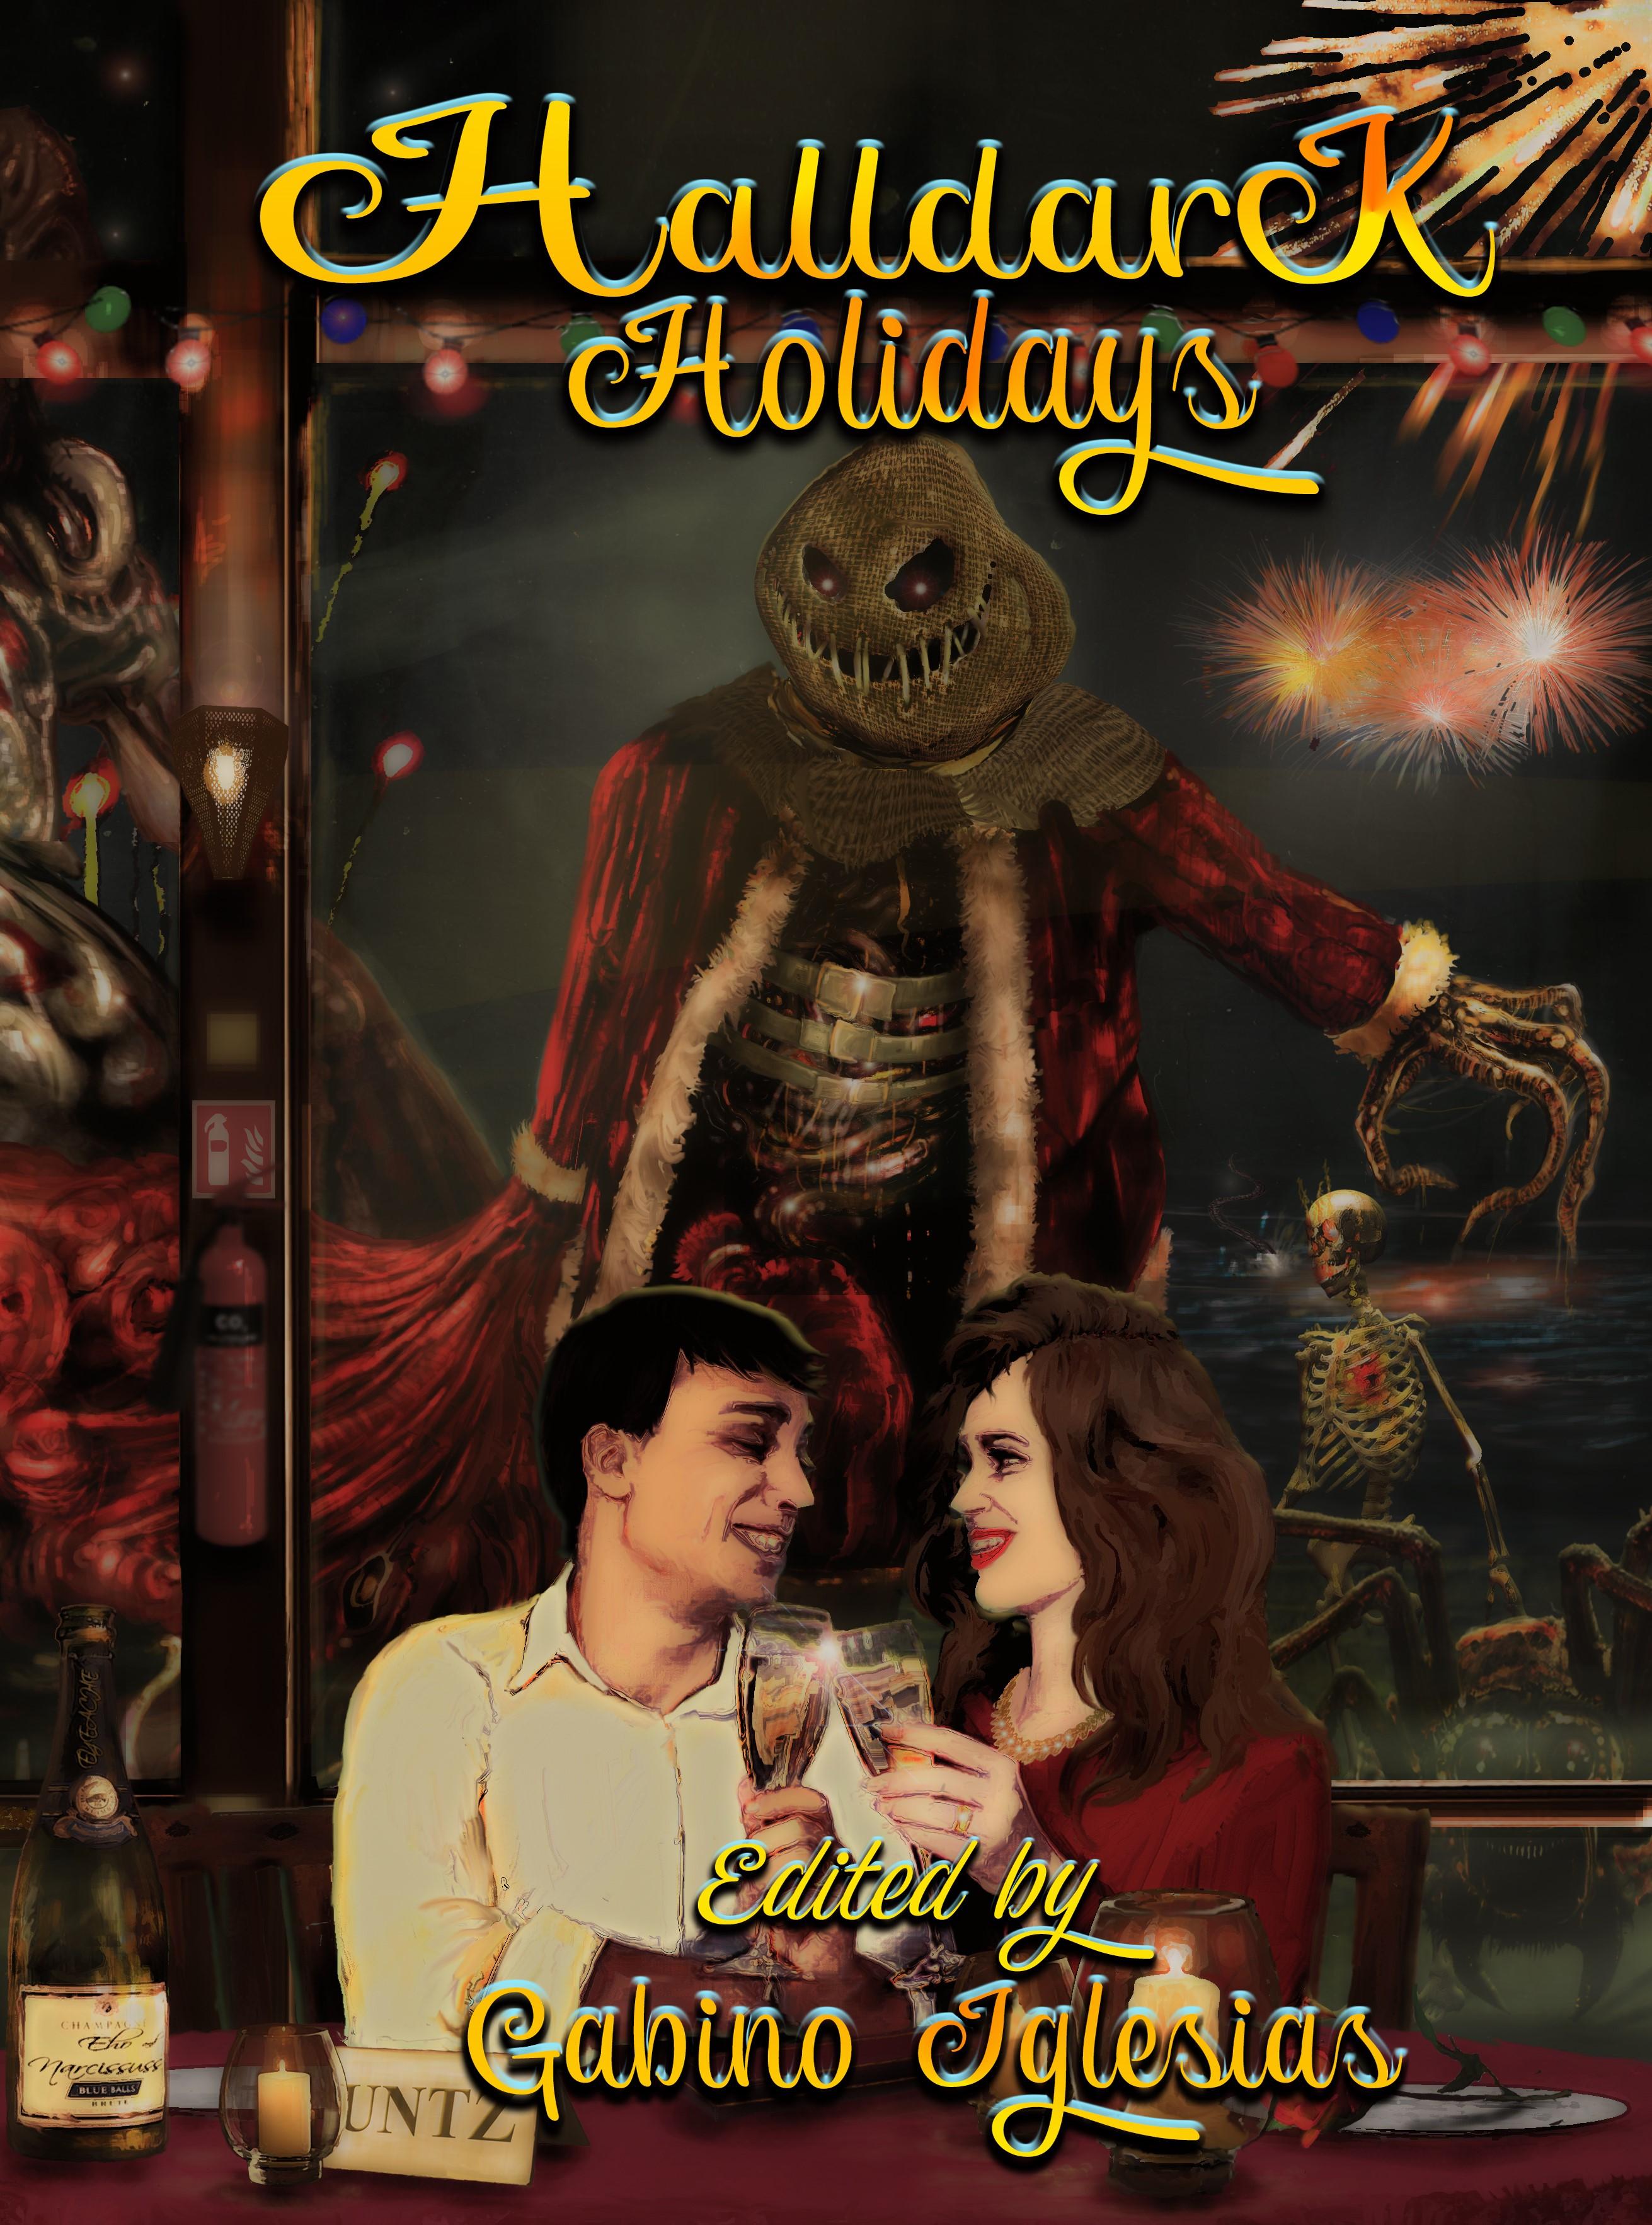 Halldark Holidays ebook Cover